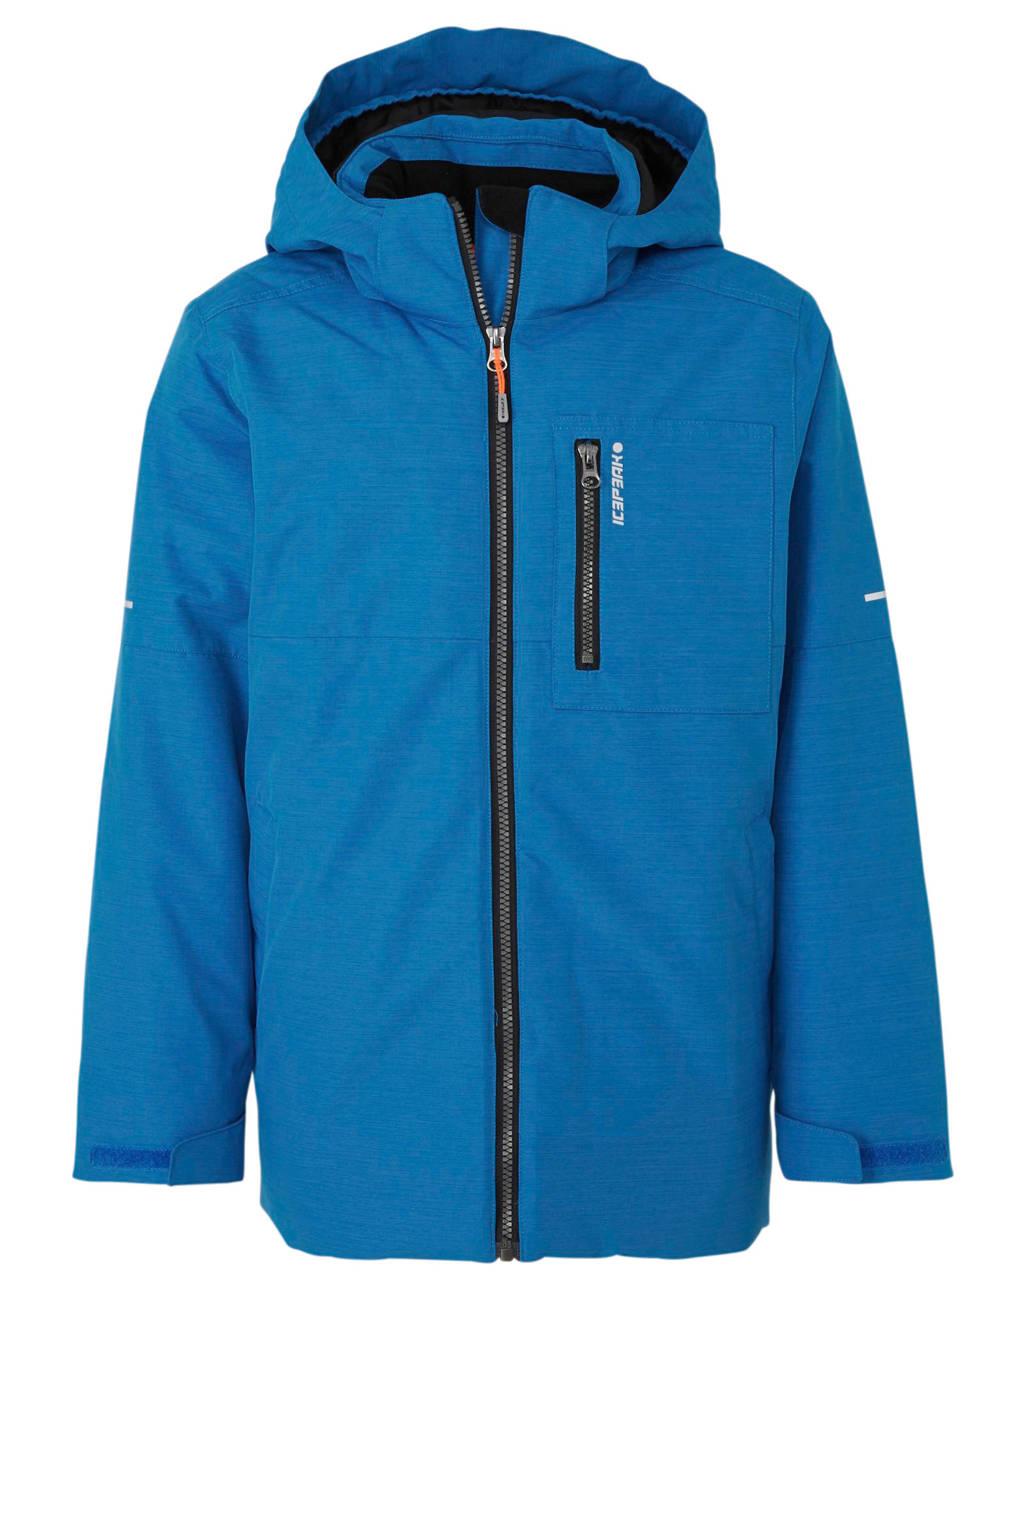 Icepeak winterjas Kennett Jr kobaltblauw, Kobaltblauw